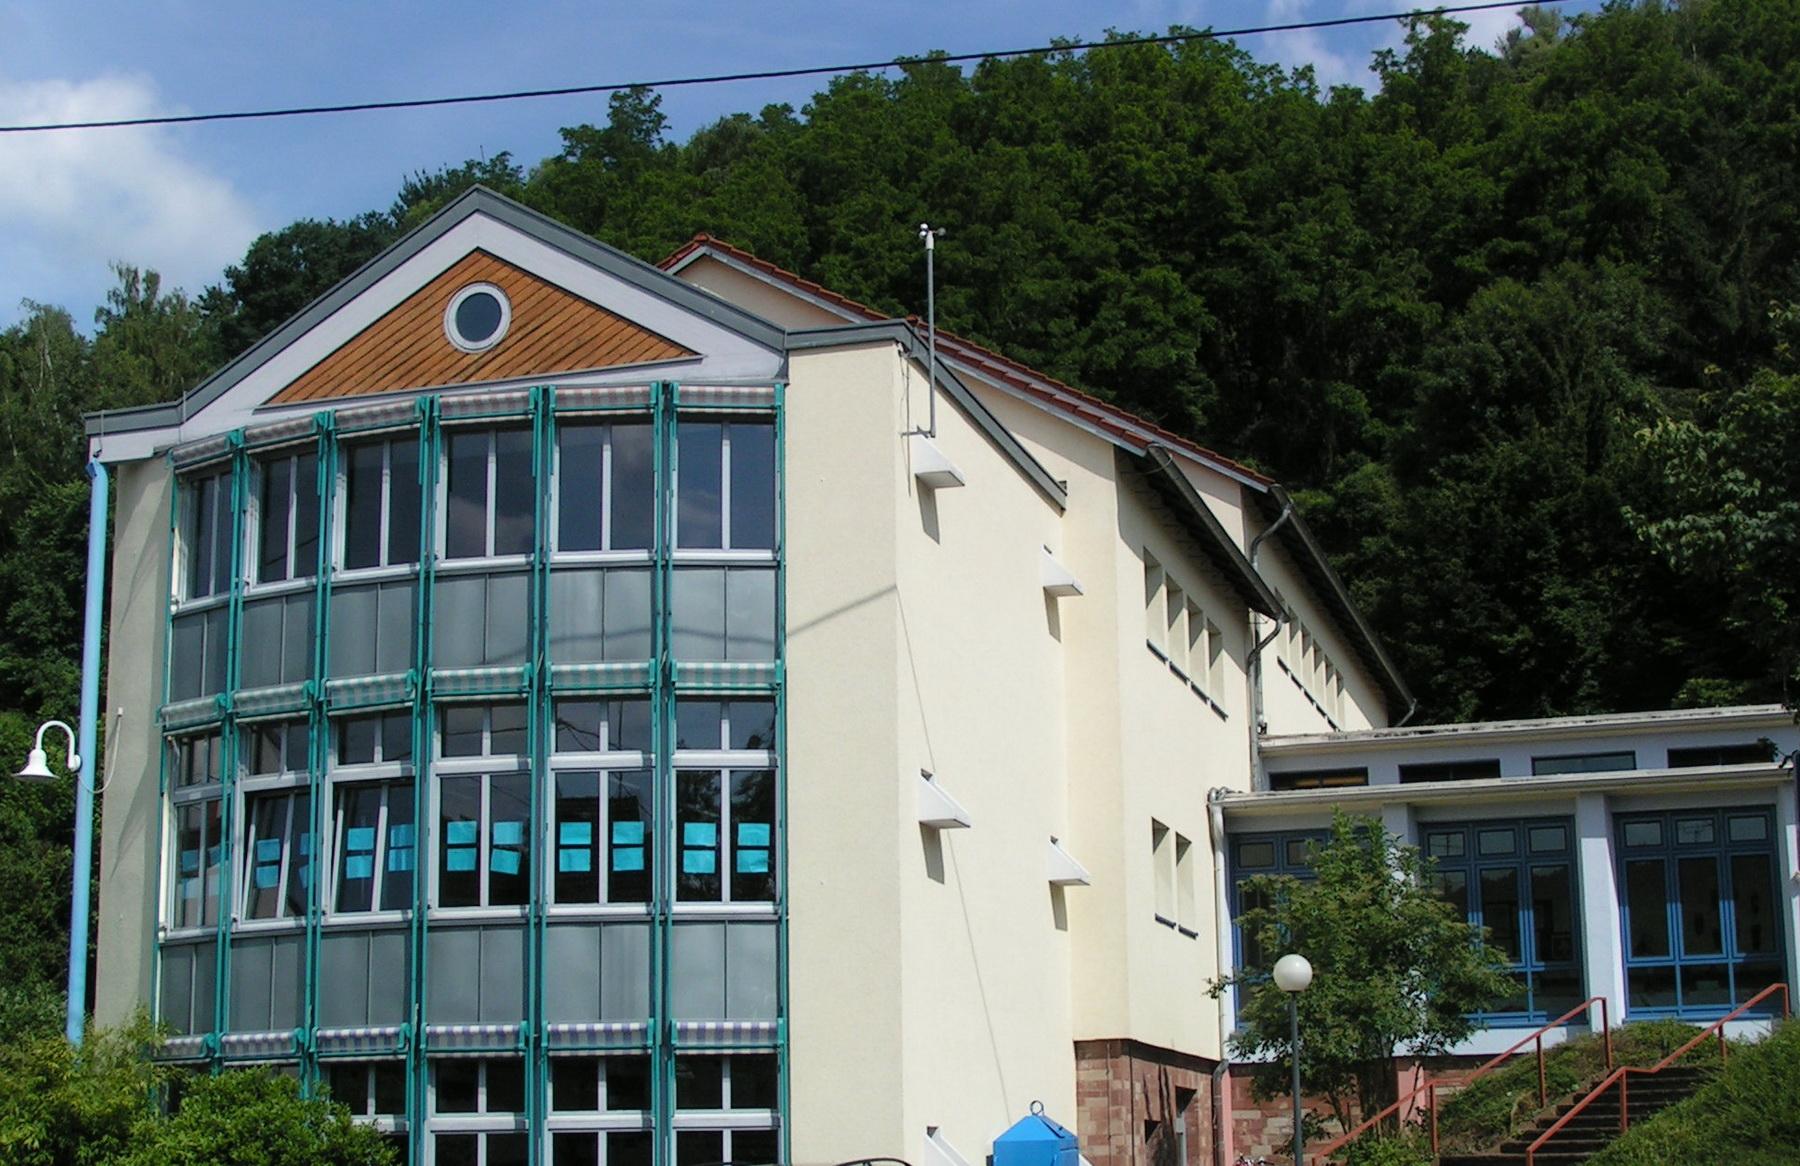 Außenansicht der Kreuzbergschule